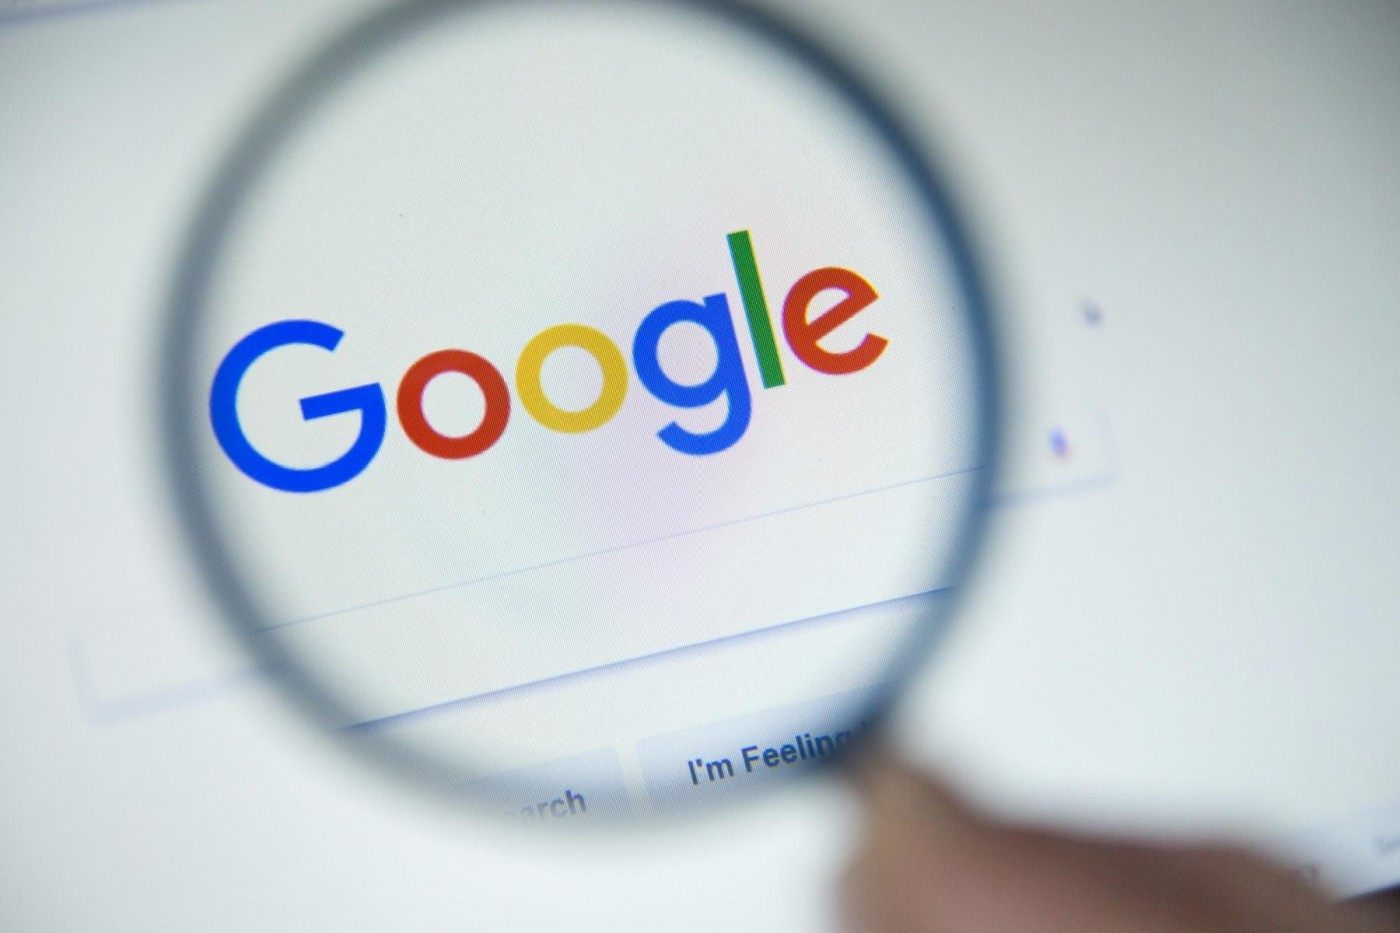 Google重返中國內心掙扎,Alphabet主席:難道我們沒有改善他們生活嗎?